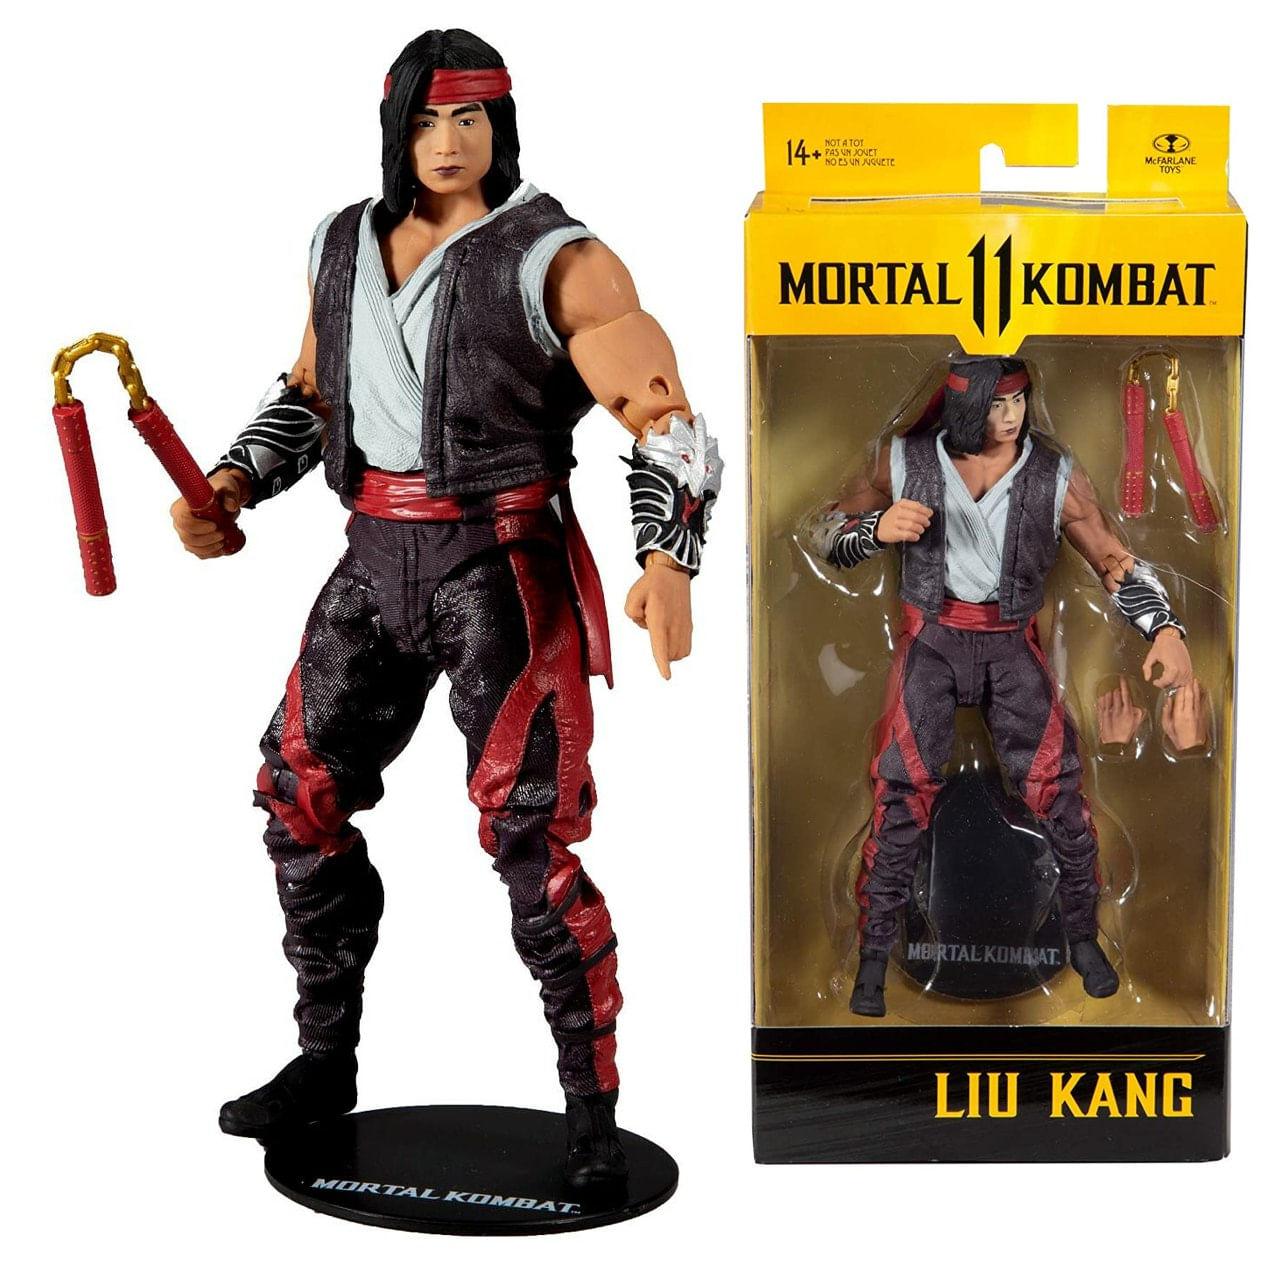 Boneco Liu Kang - Mortal Kombat 11 Action Figure - Mcfarlane